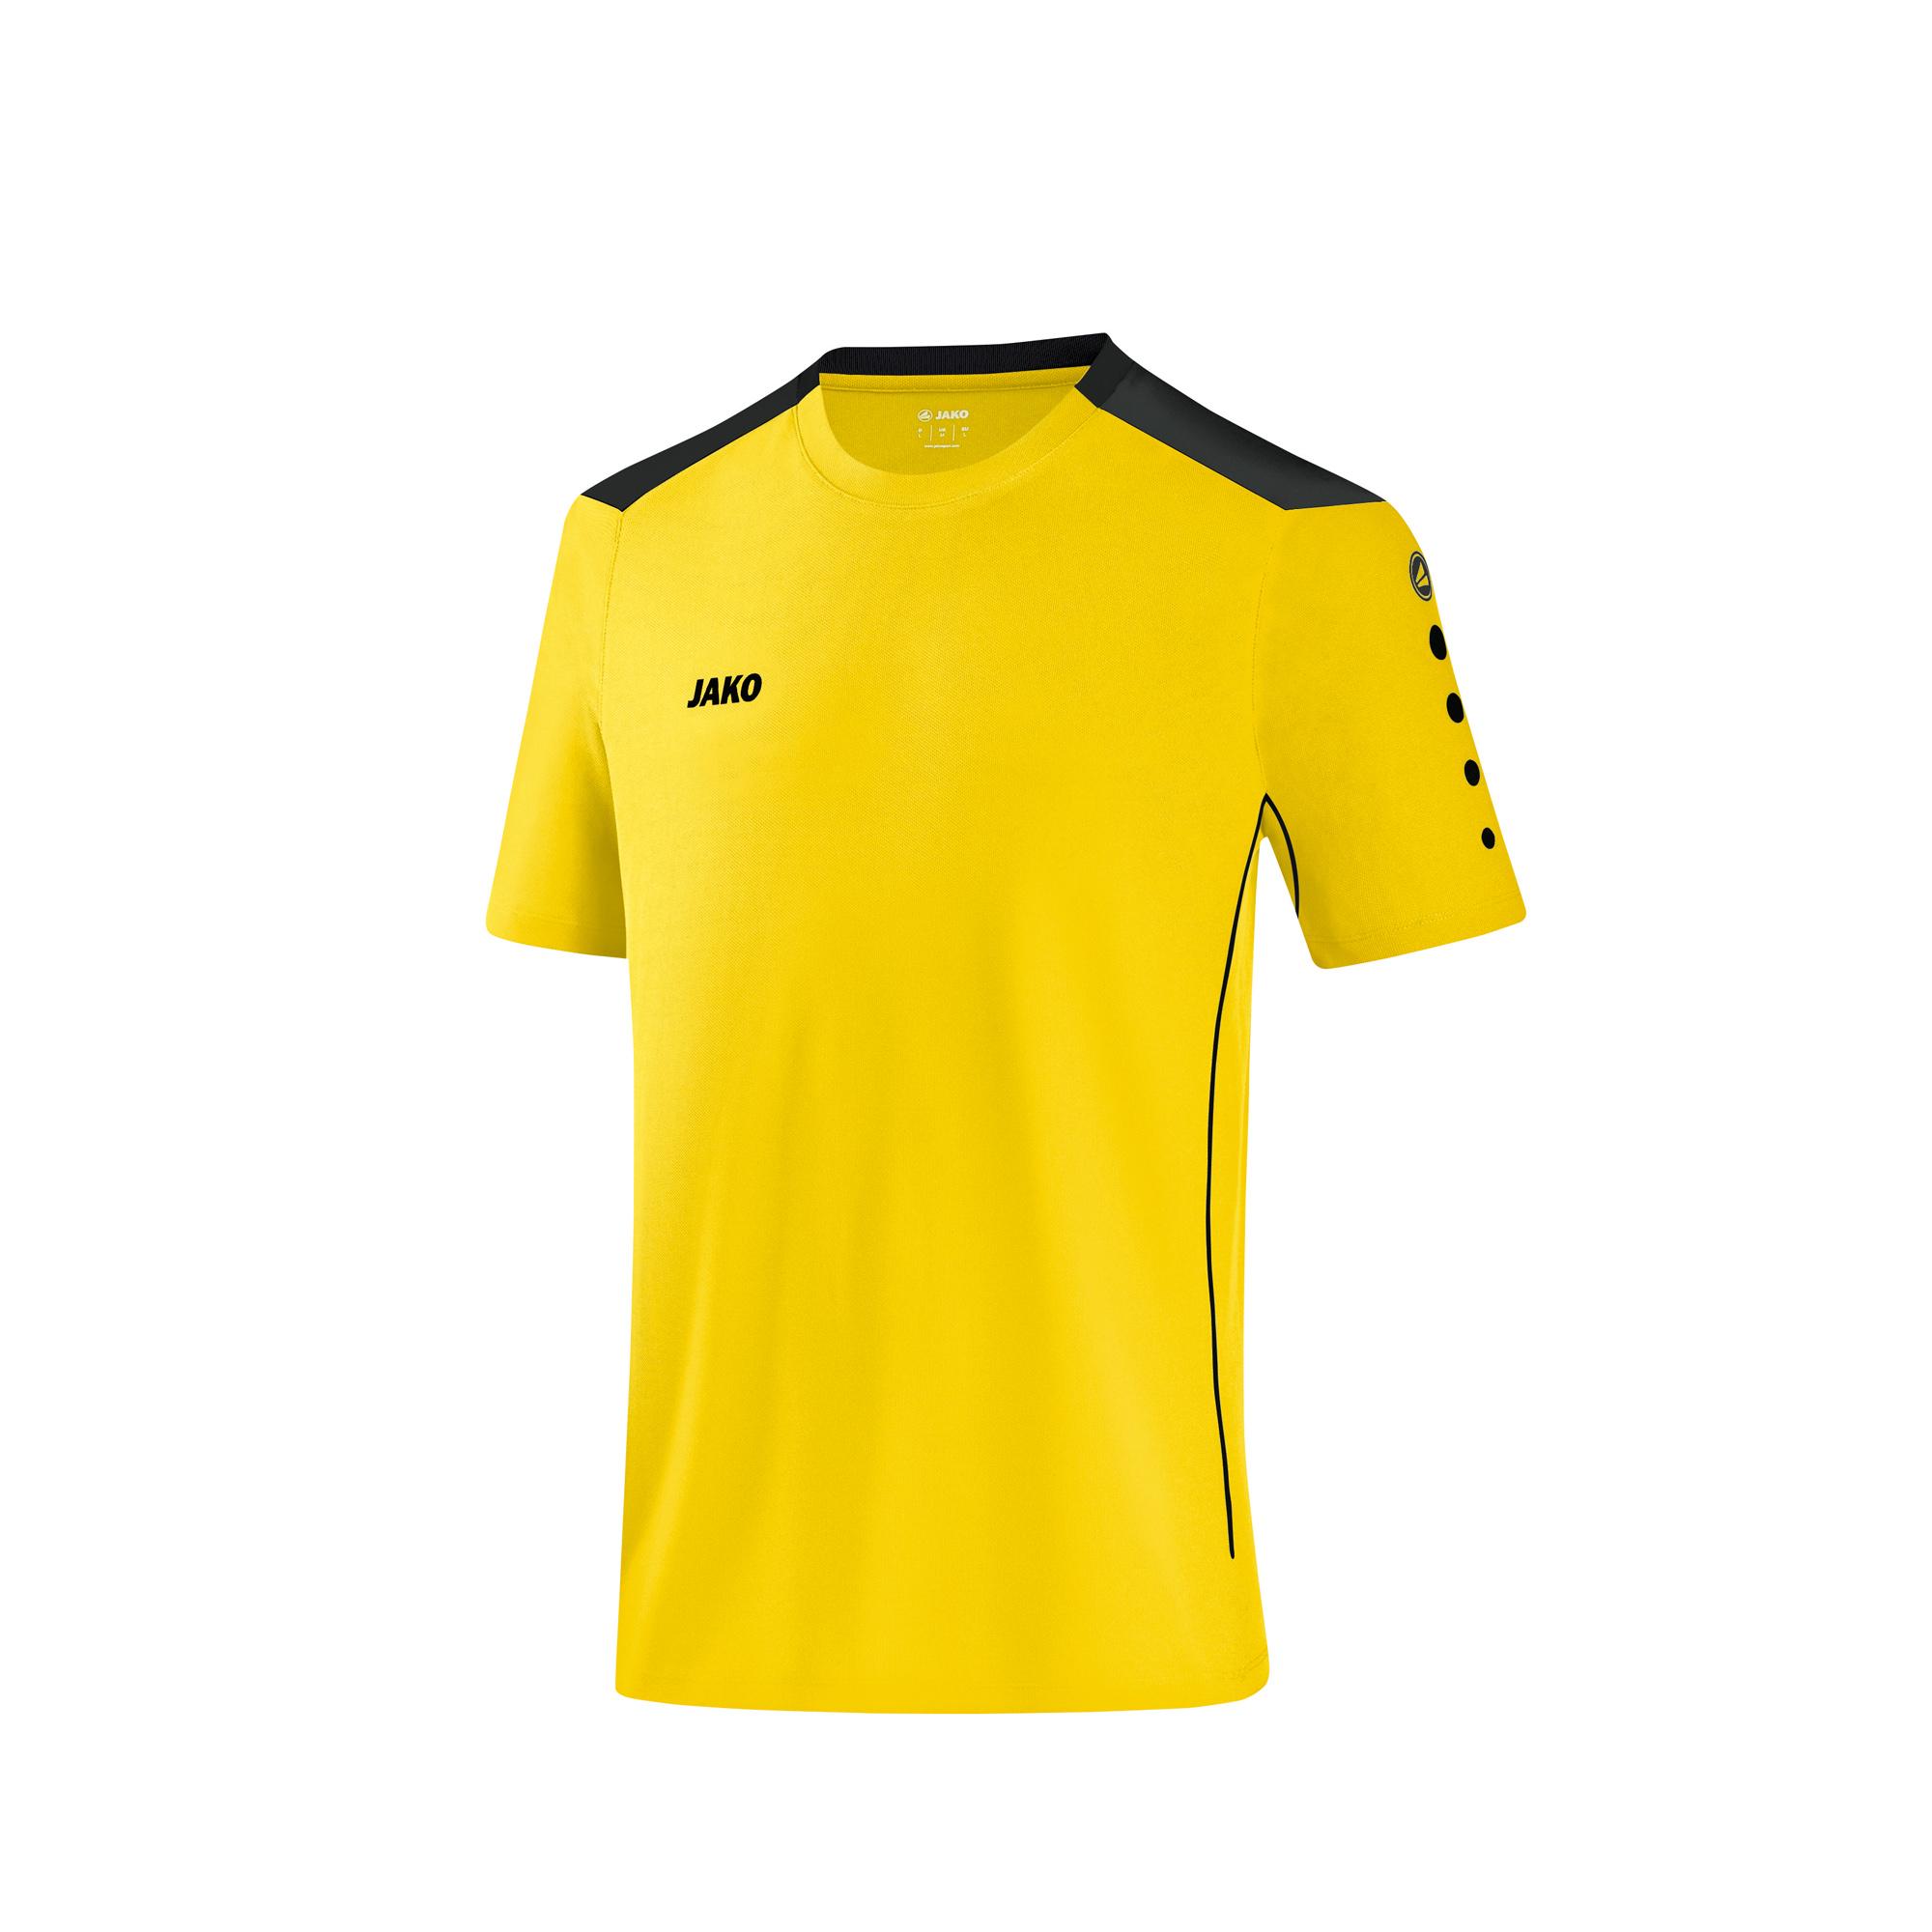 Jako T-Shirt Cup 6183-03 XL